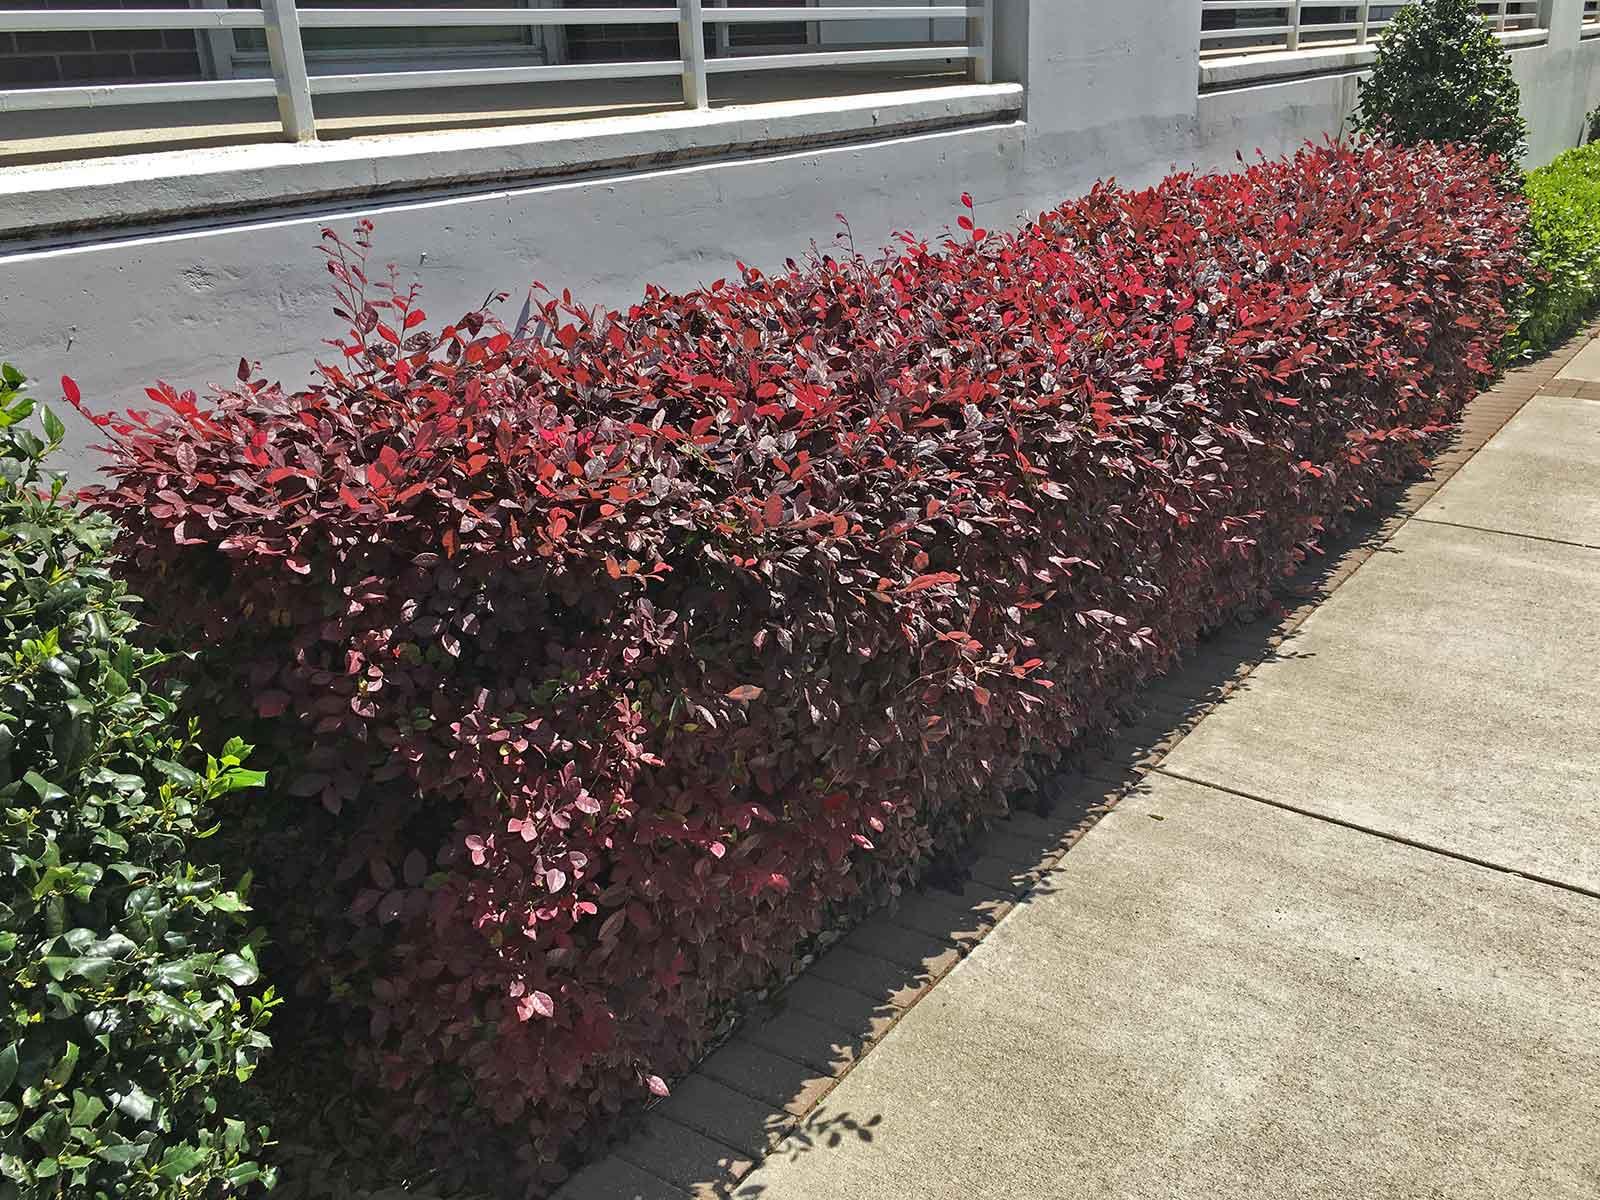 Hedge form  - Here Lorepetalum us used as a foundation planting along a sidewalk.